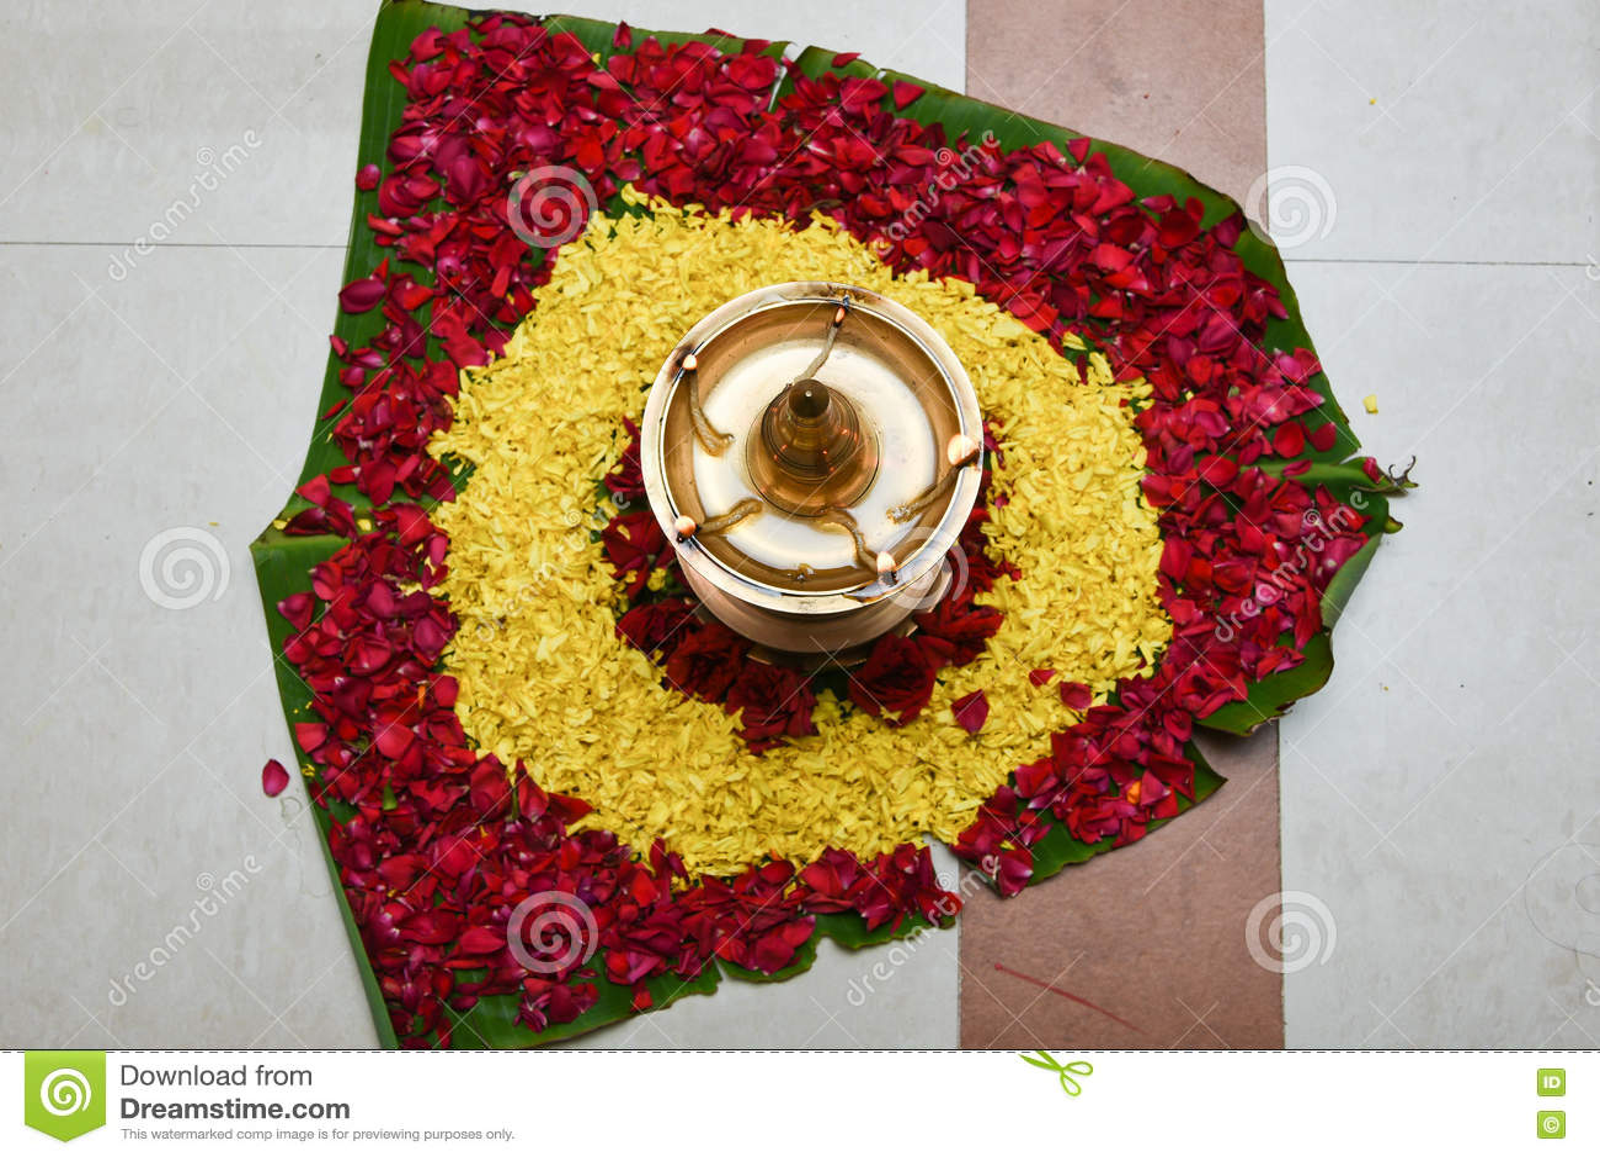 Oil Lamp For Onam Festival Kerala India Stock Image - Image